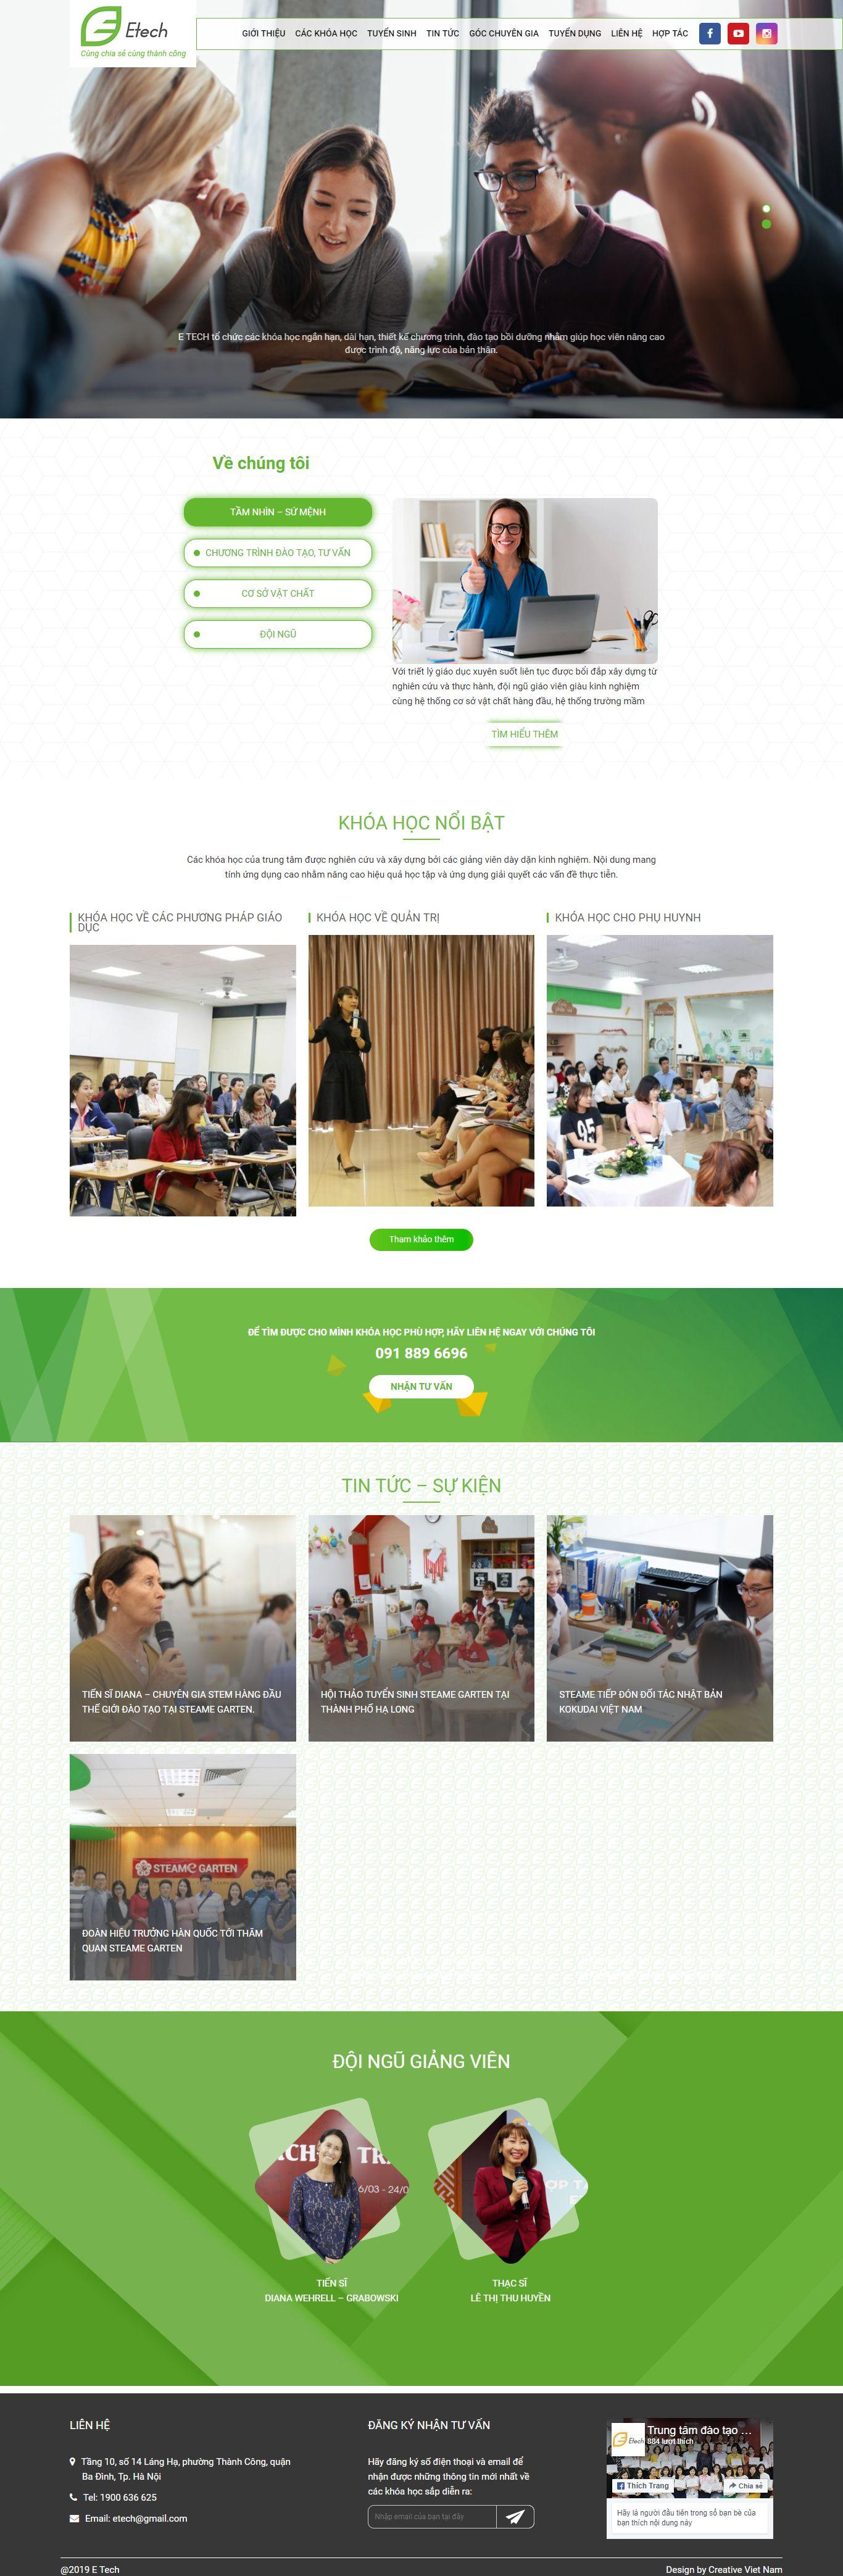 mẫu website đào tạo etech